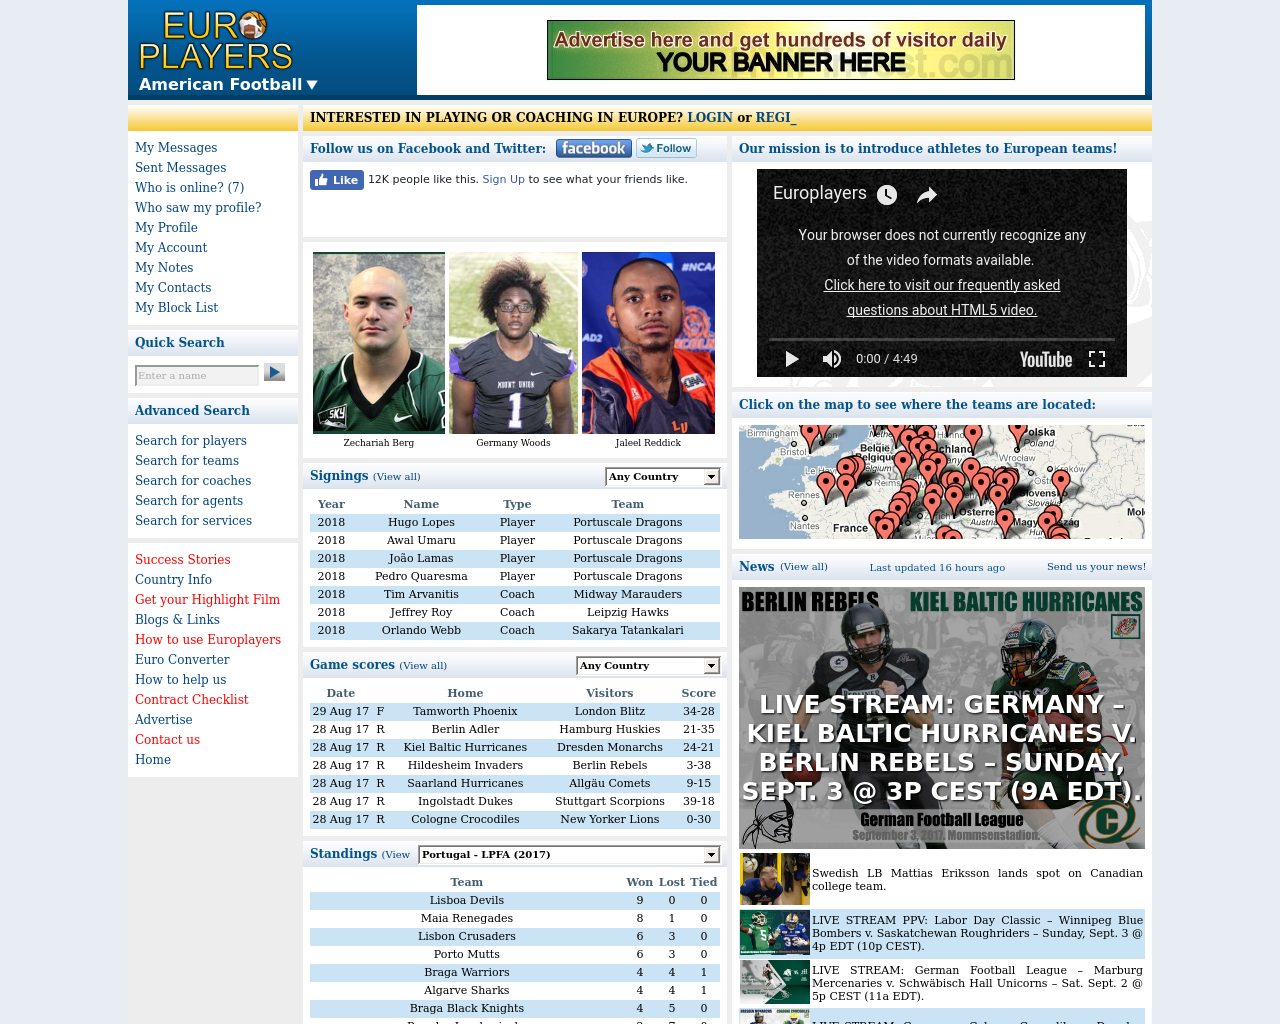 Europlayers-Advertising-Reviews-Pricing